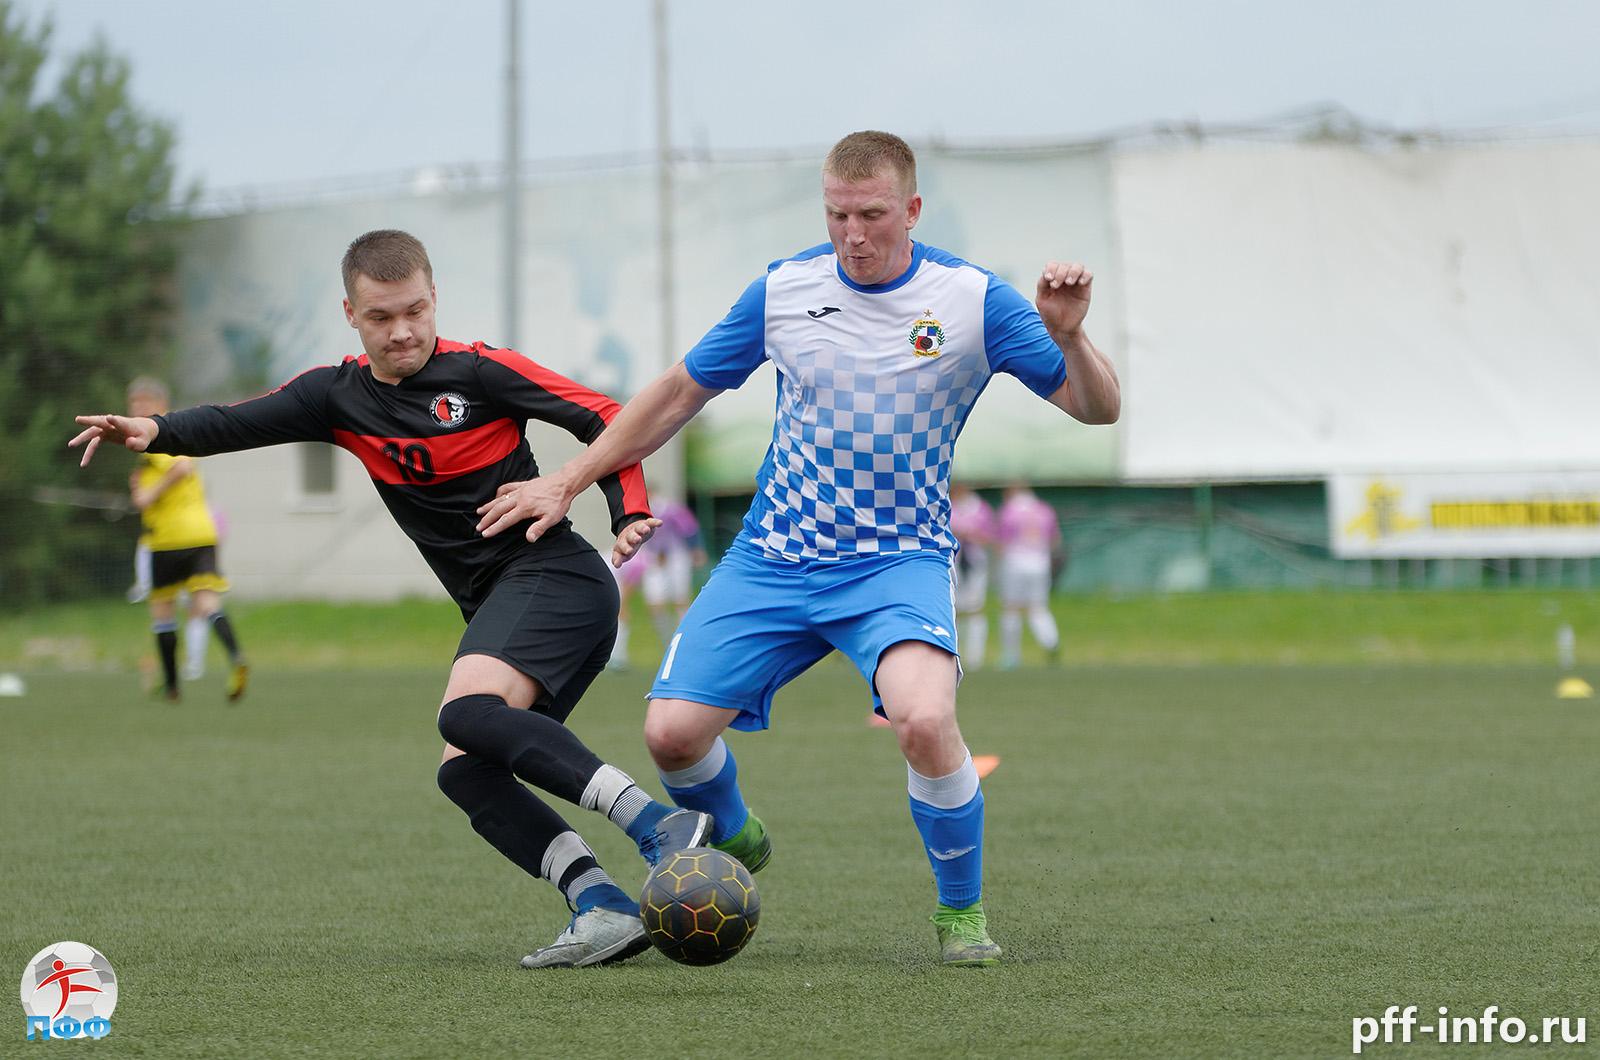 Премьер-лига ТДК. 14 тур. Матч тура